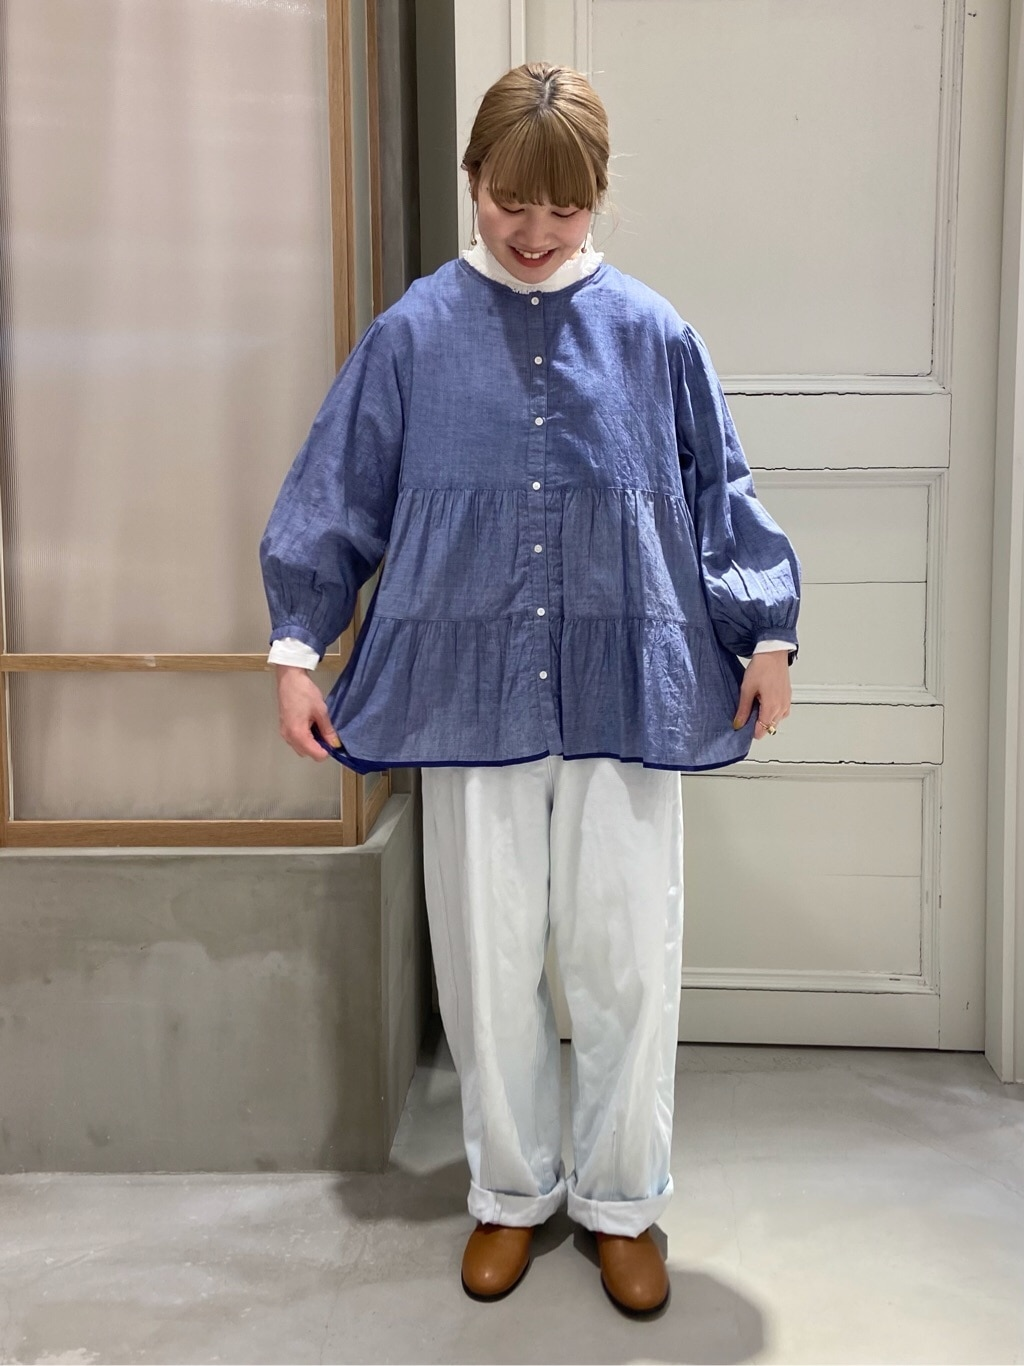 bulle de savon 渋谷スクランブルスクエア 身長:160cm 2021.03.13